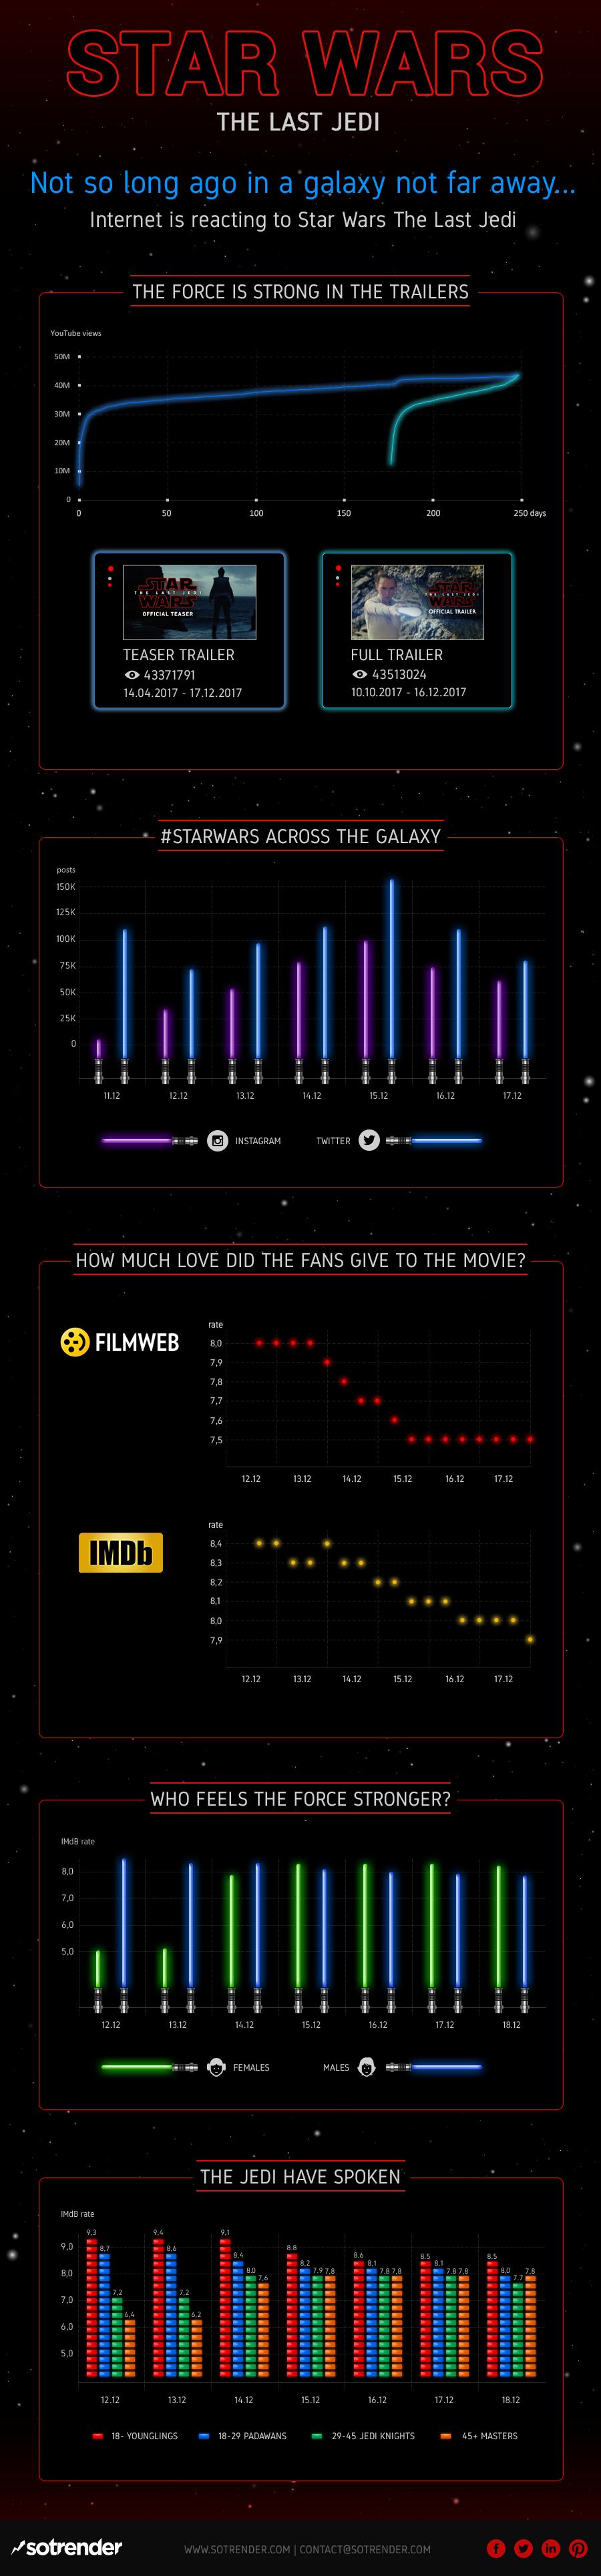 Star Wars The Last Jedi Infographic